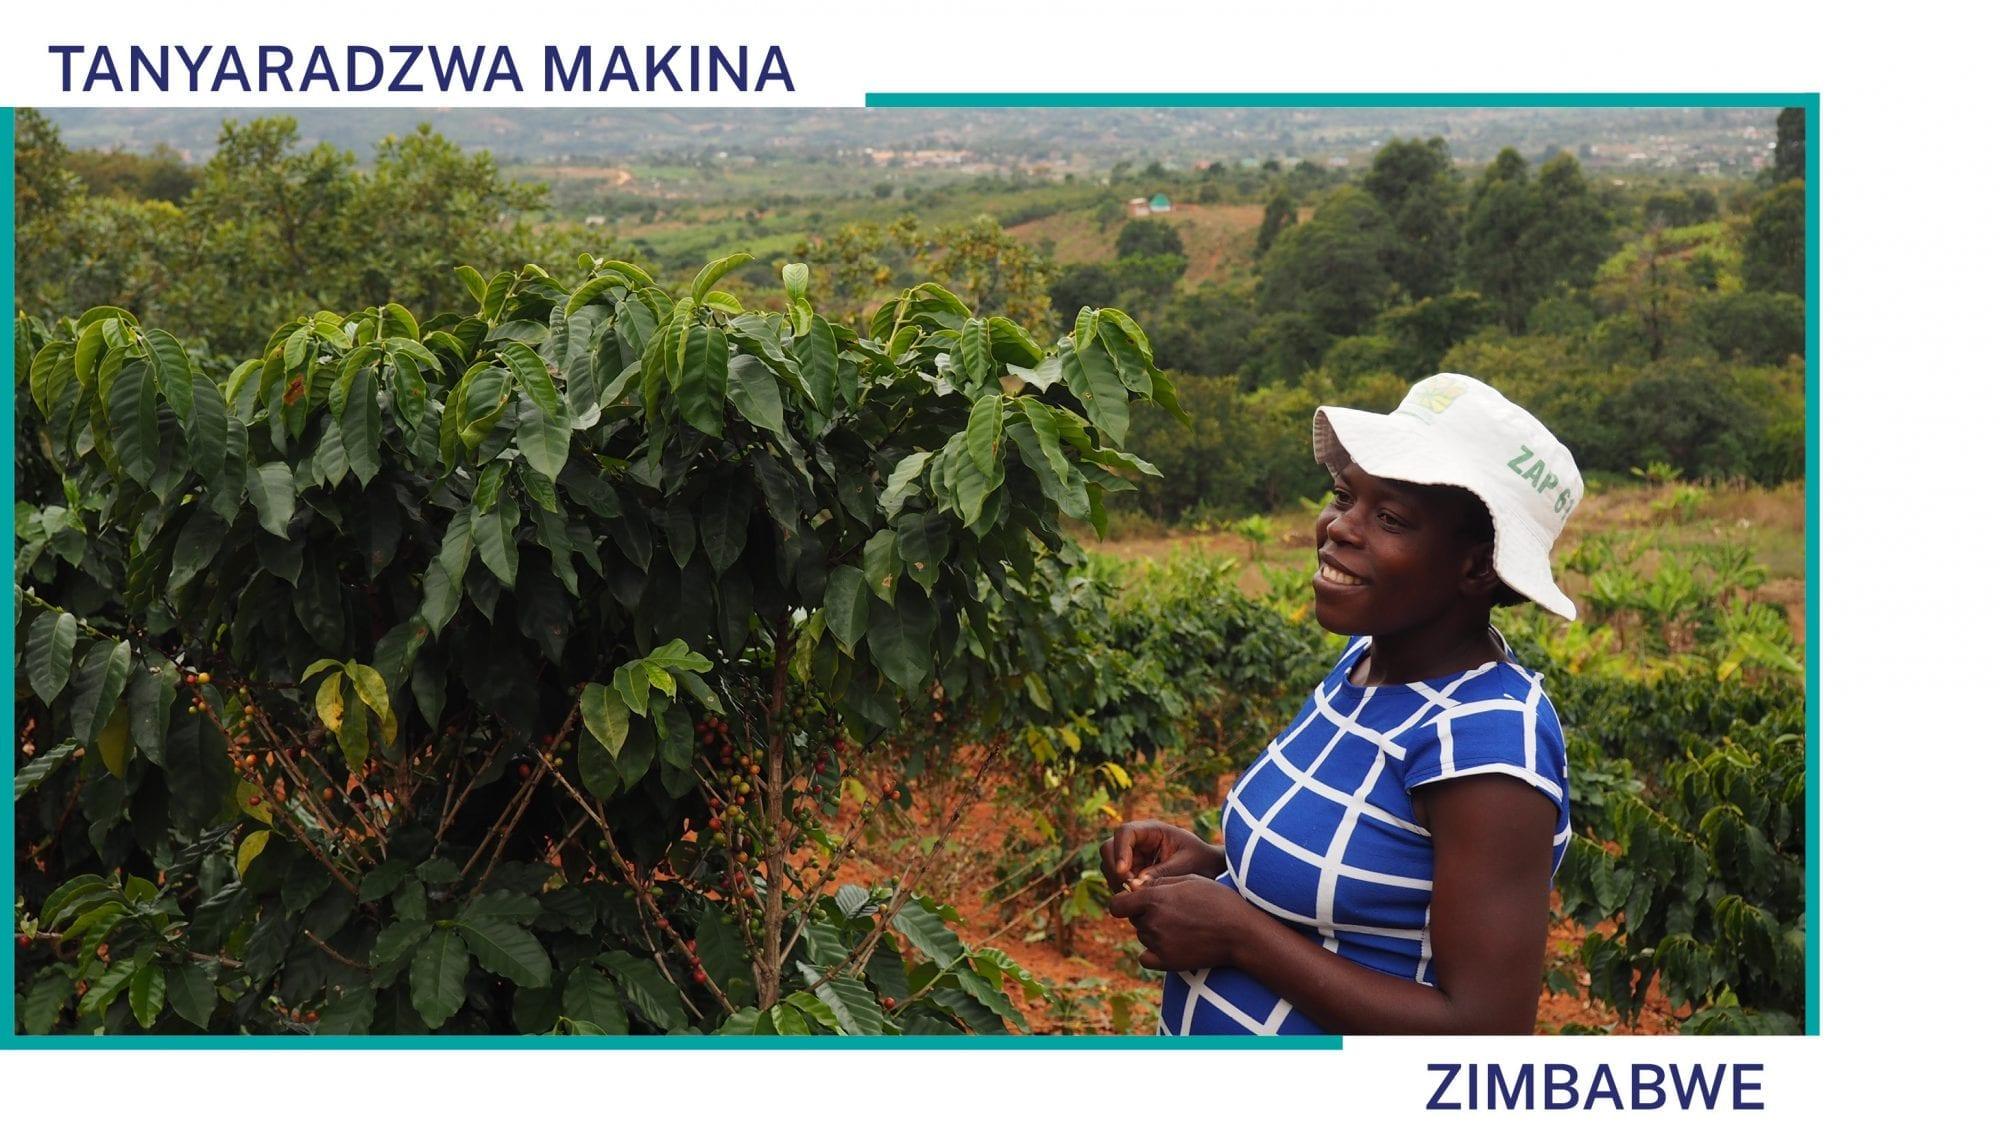 Tanyaradzwa Makina stands on her coffee farm in Zimbabwe